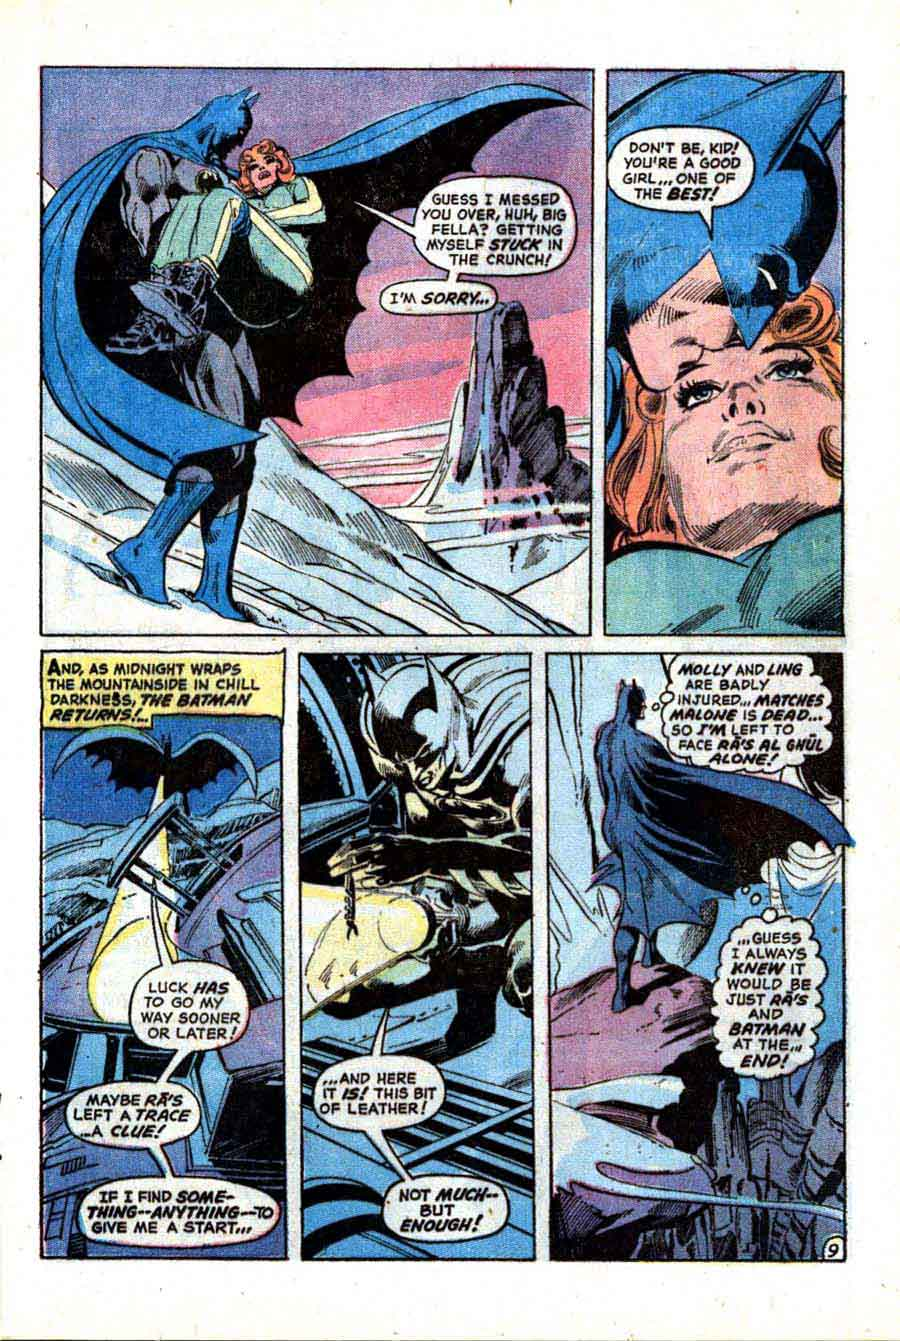 Batman v1 #244 dc comic book page art by Neal Adams